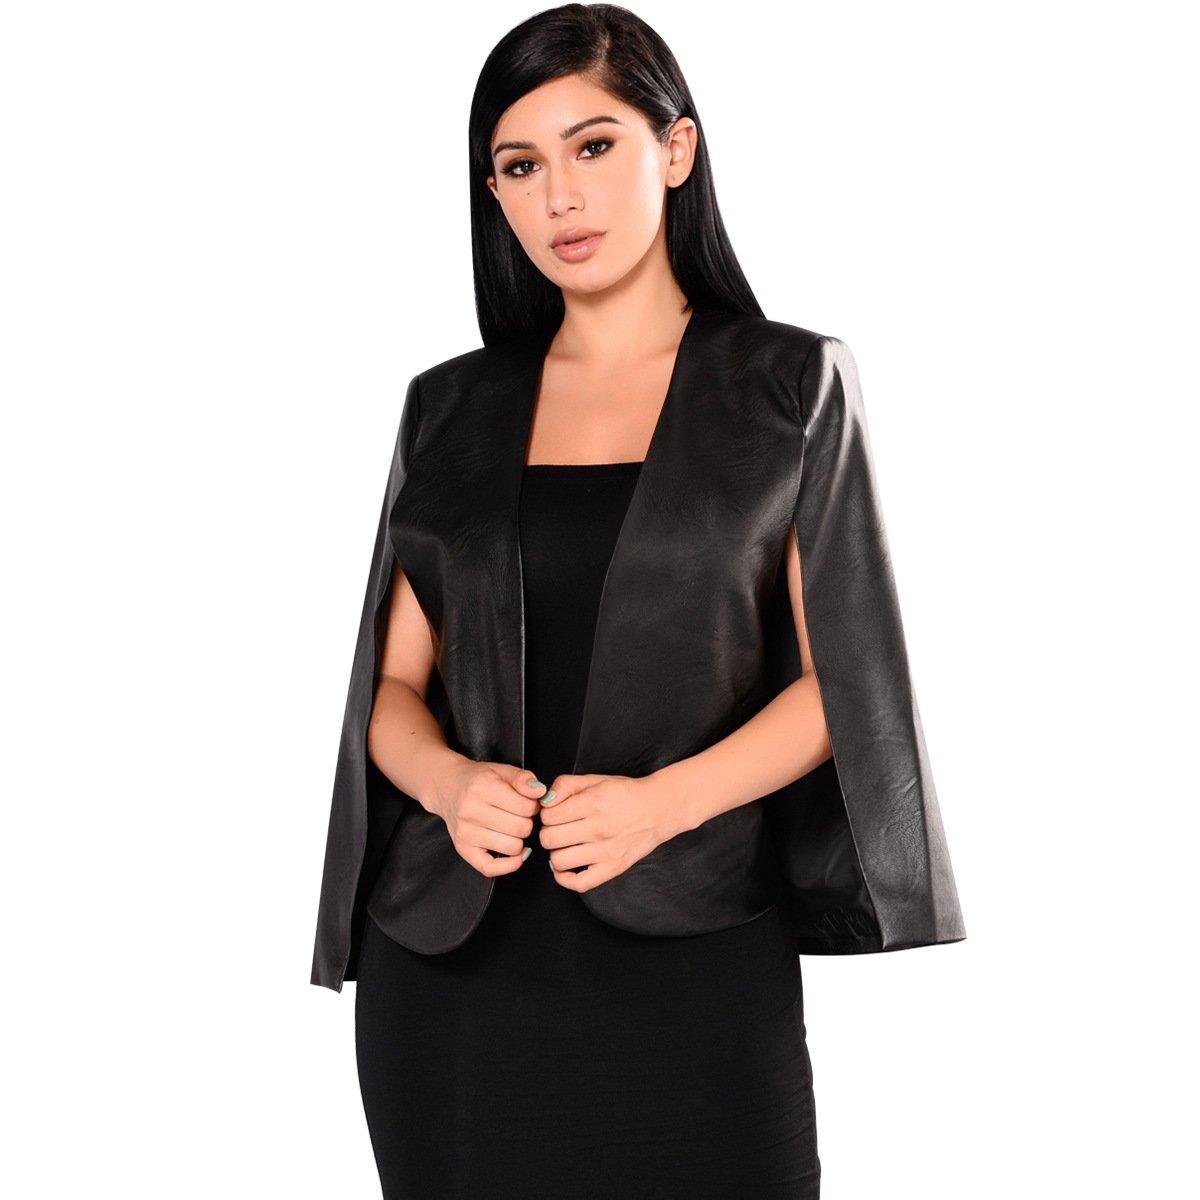 PrettySoul Women's Casual Cape Blazer Shawl Collar Split Sleeve African Dashiki Floral Print Cloak Blazer Jacket Coat Black, Large